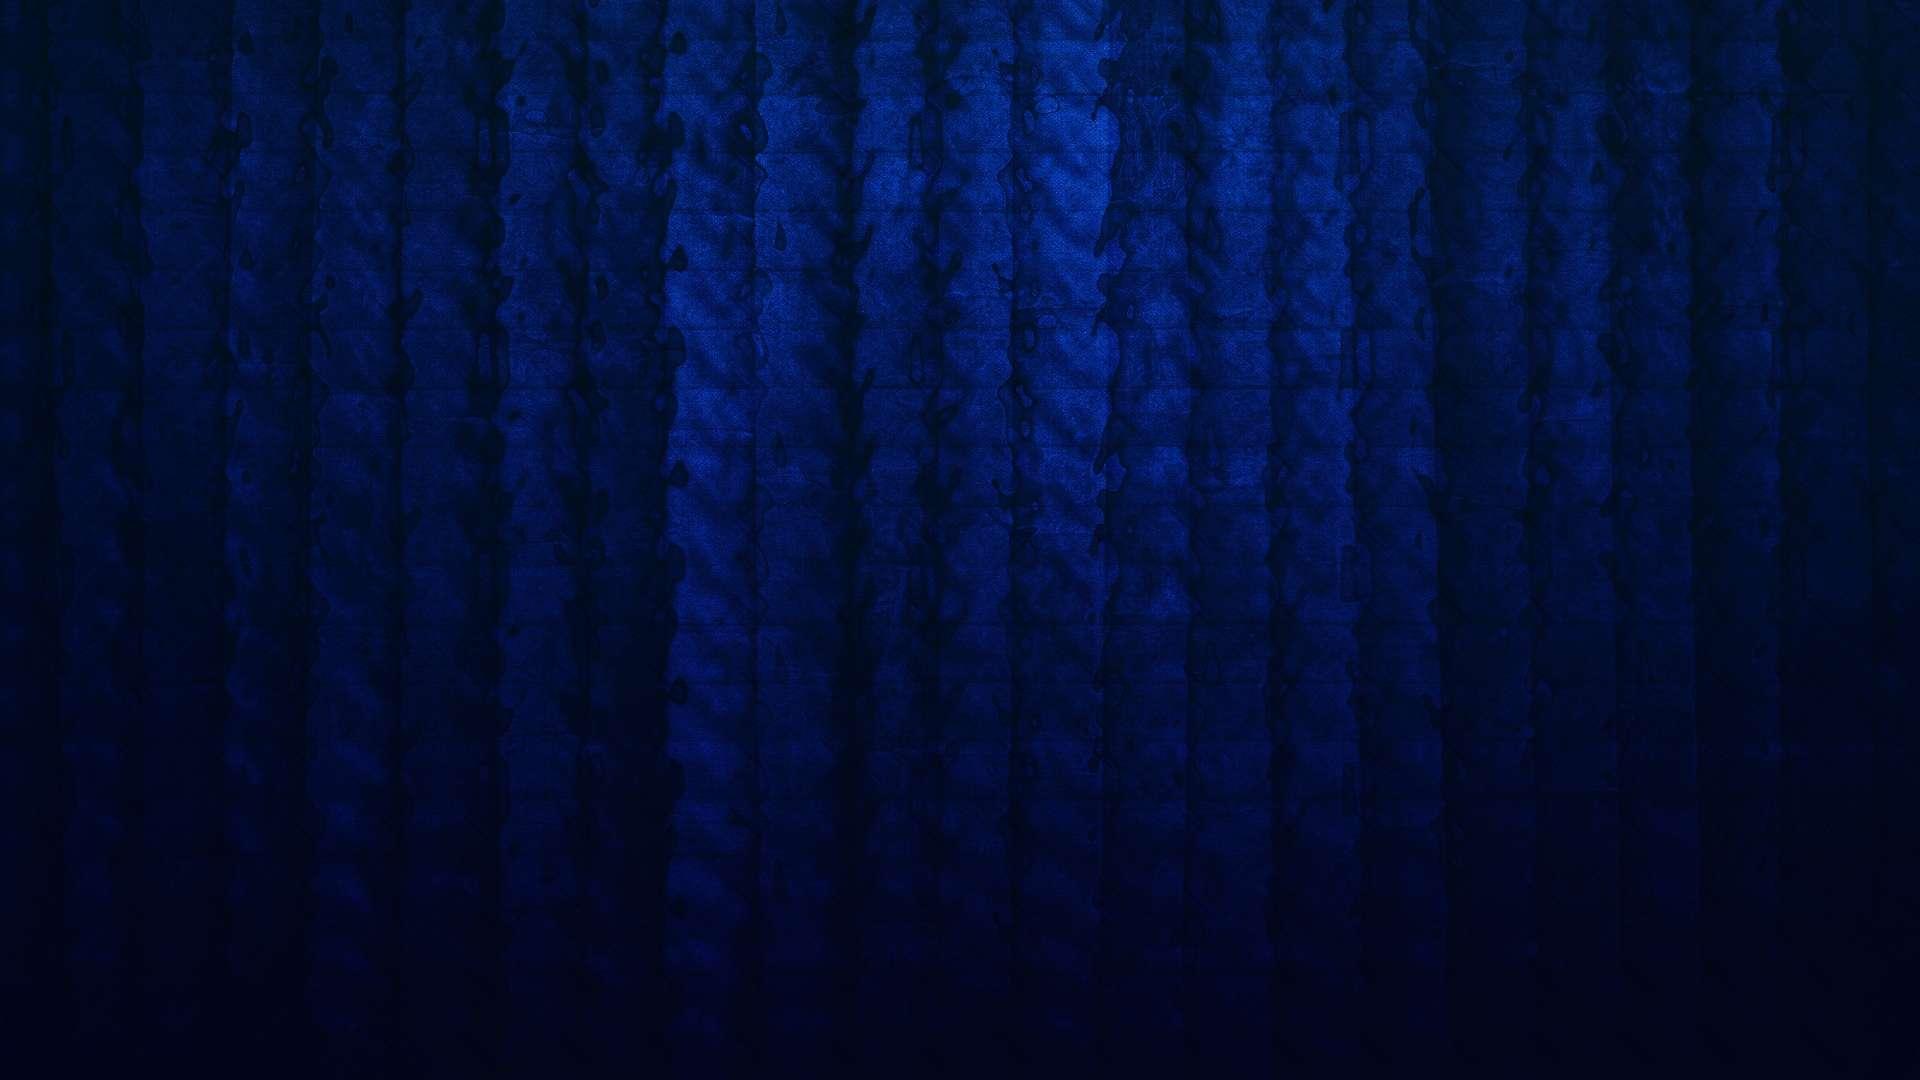 Wallpaper Texture Blue Stripes Dark Hd Wallpaper 1080p Upload at 1920x1080